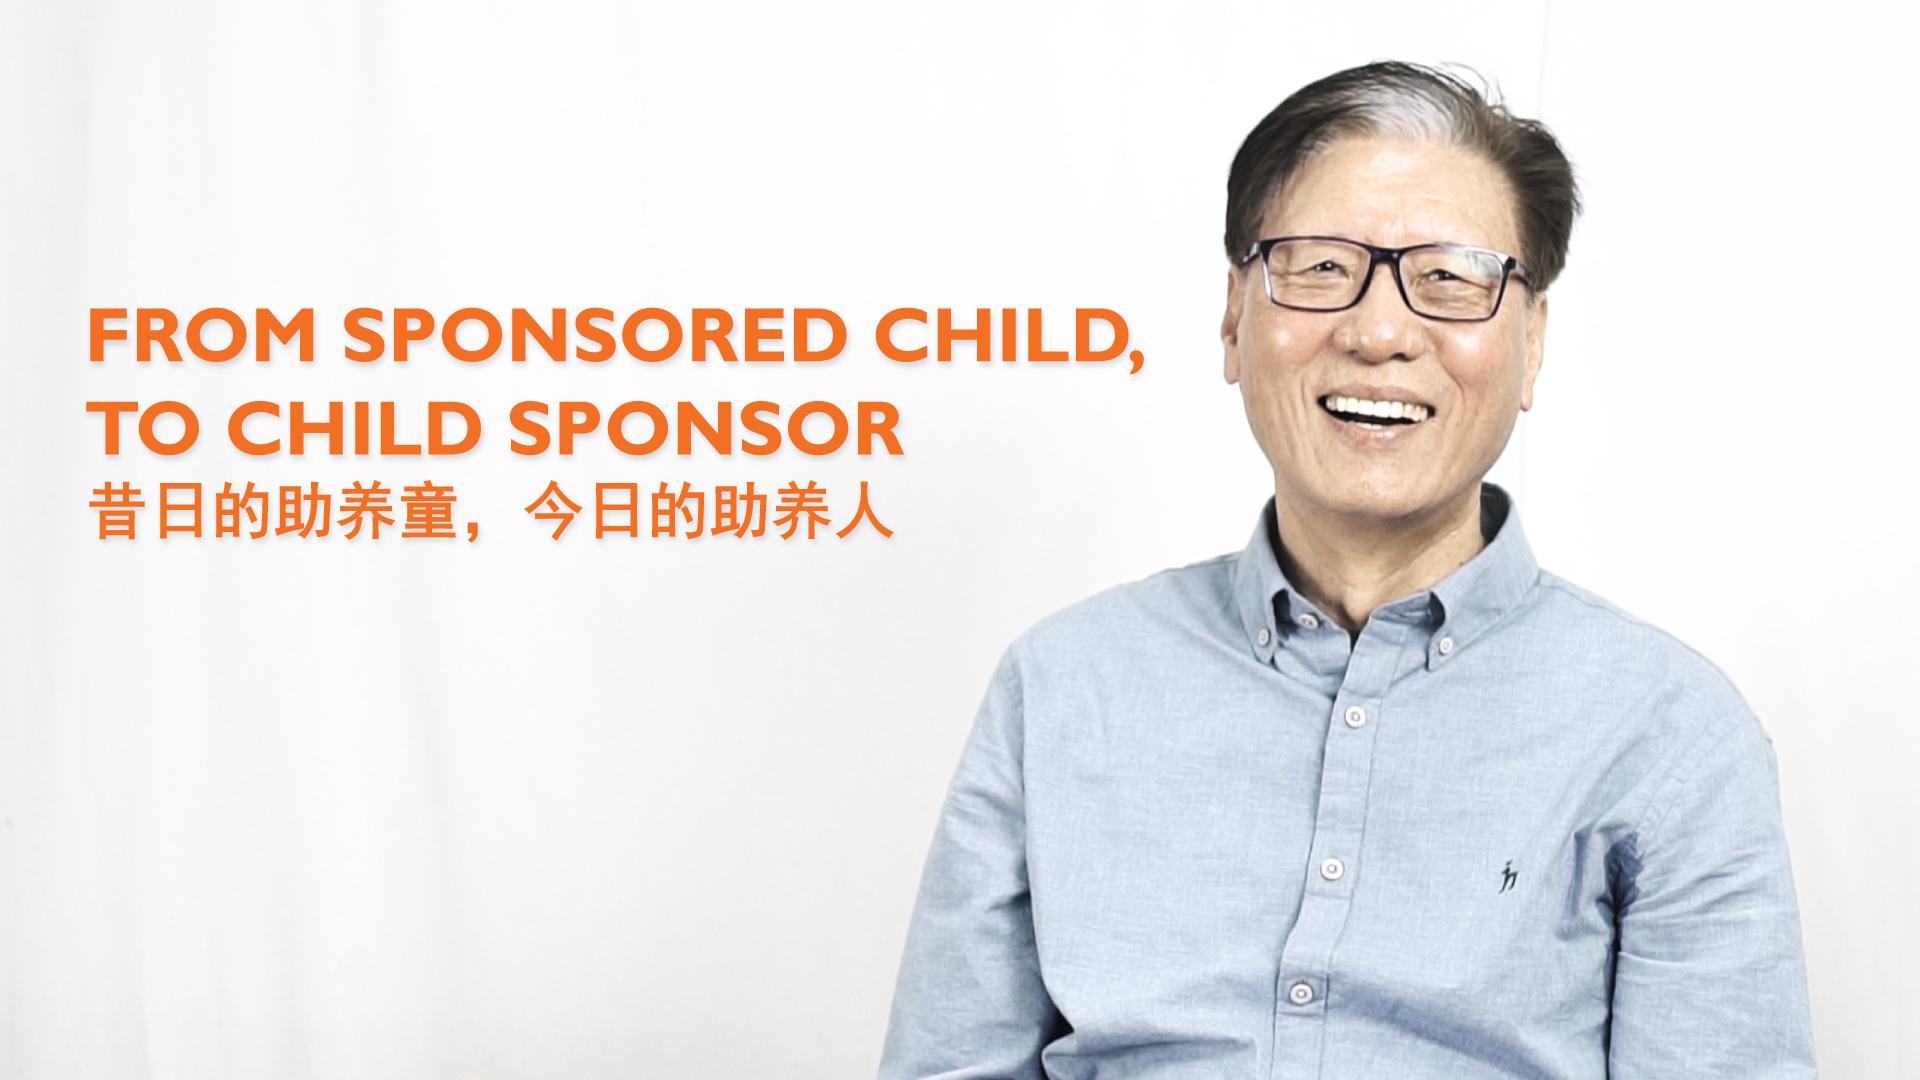 Mr Oh: Former Sponsored Child